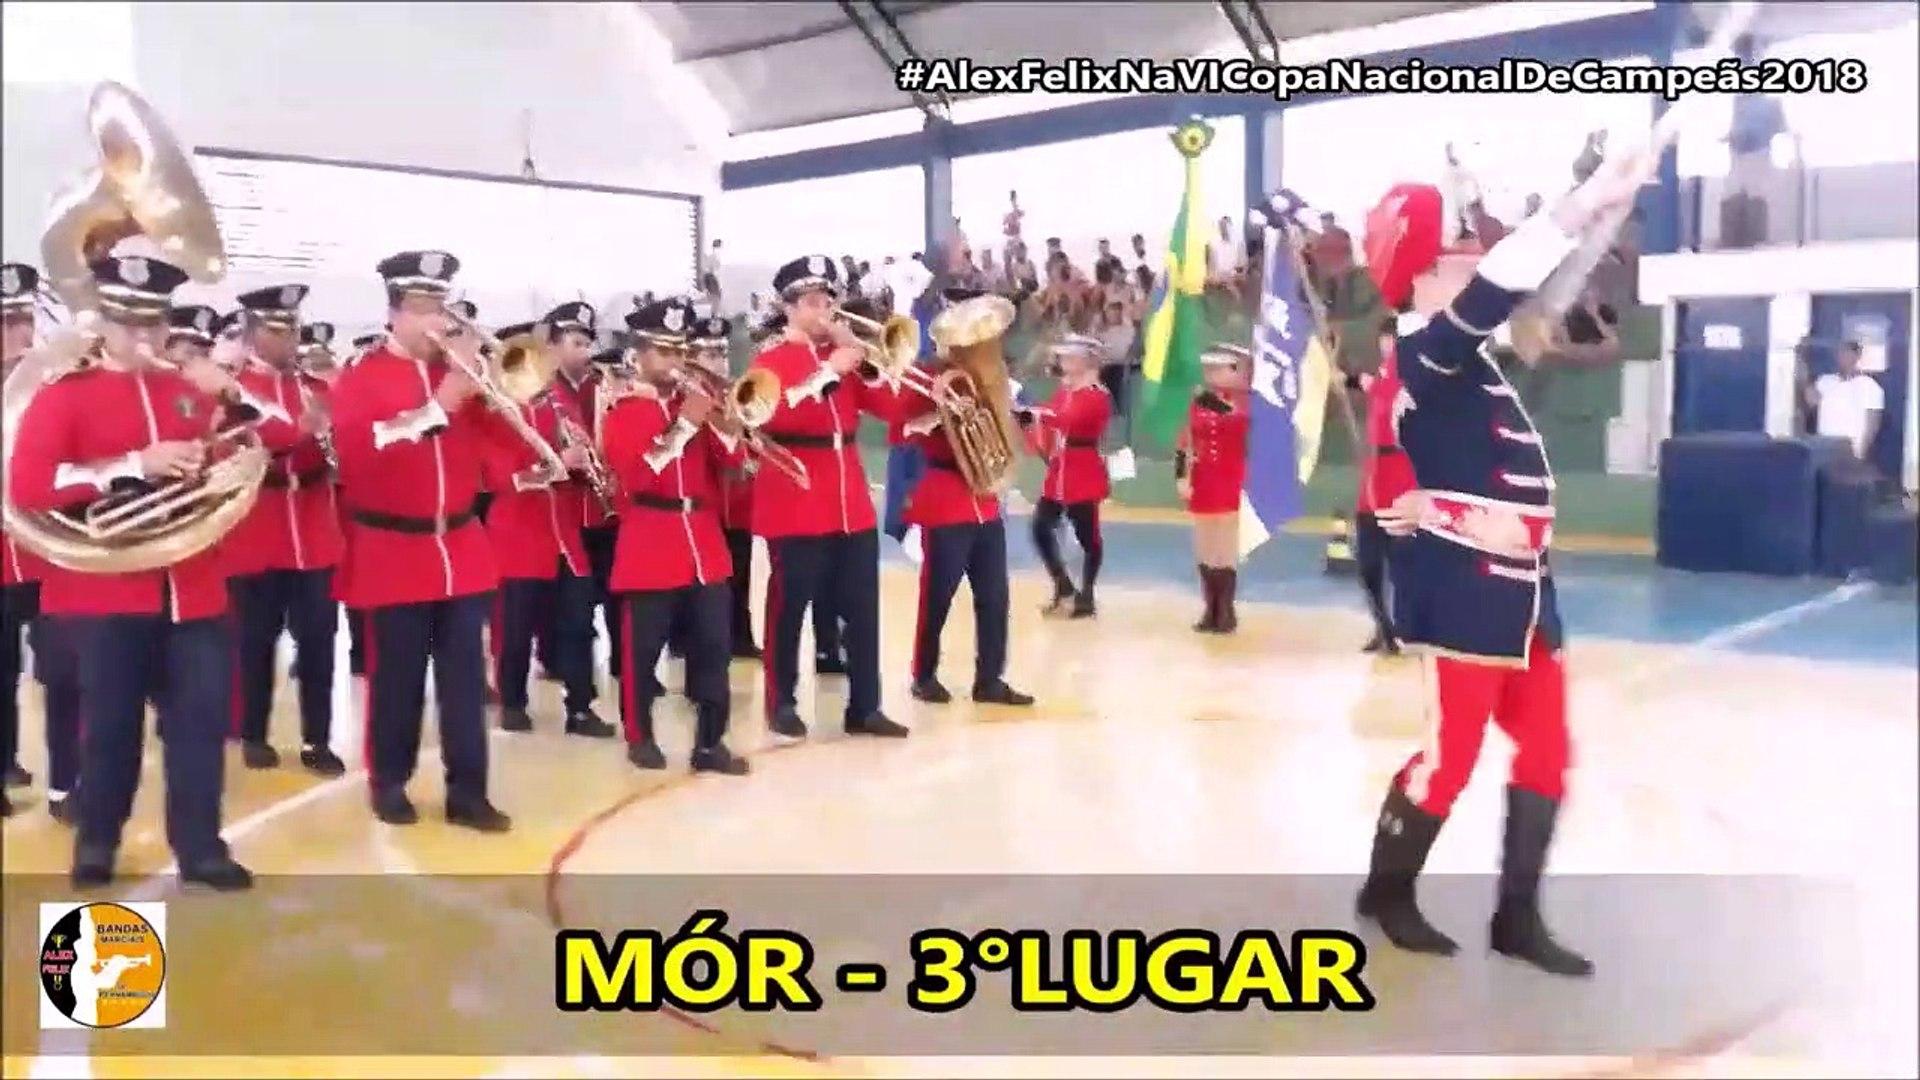 Resultado Banda Marcial Juvenil e Musical Master 2018 - VI Copa Nacional de Campeãs de Bandas